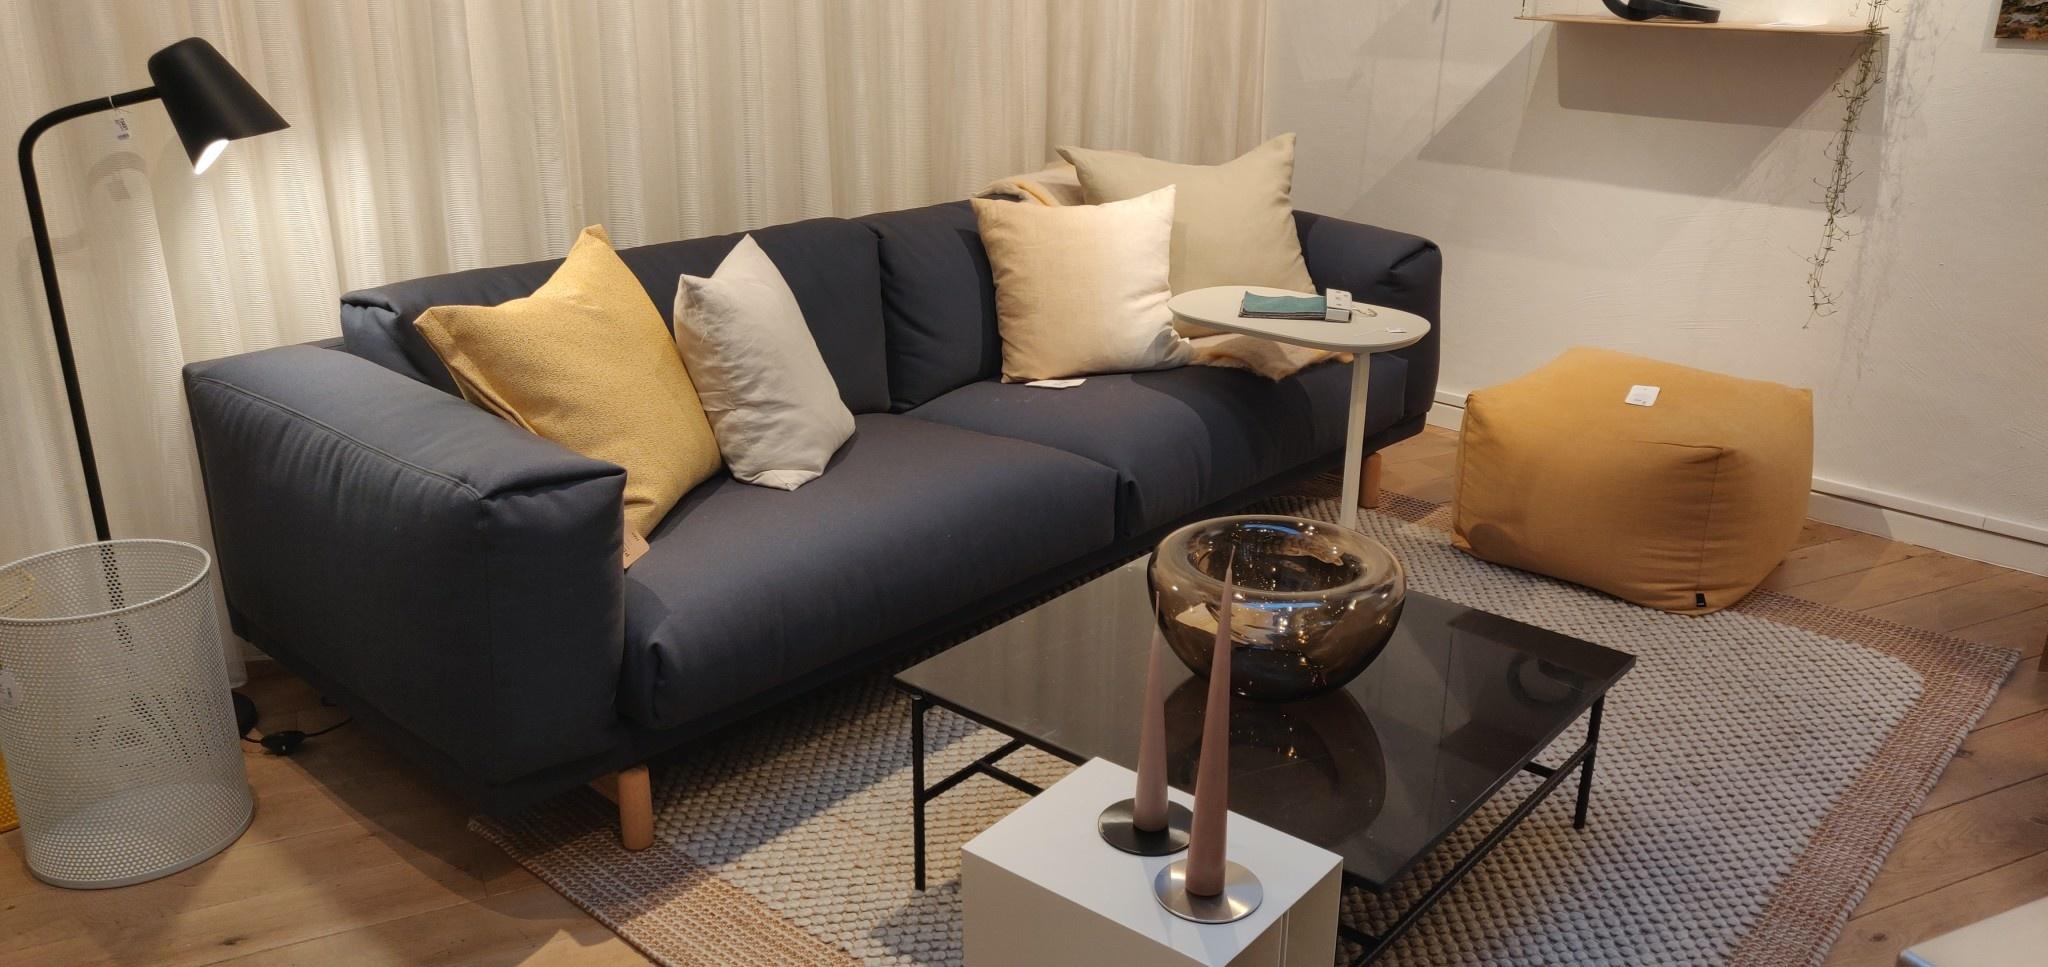 Toonzaalmodel Rest sofa - 3-seater - Steelcut trio3 756-1